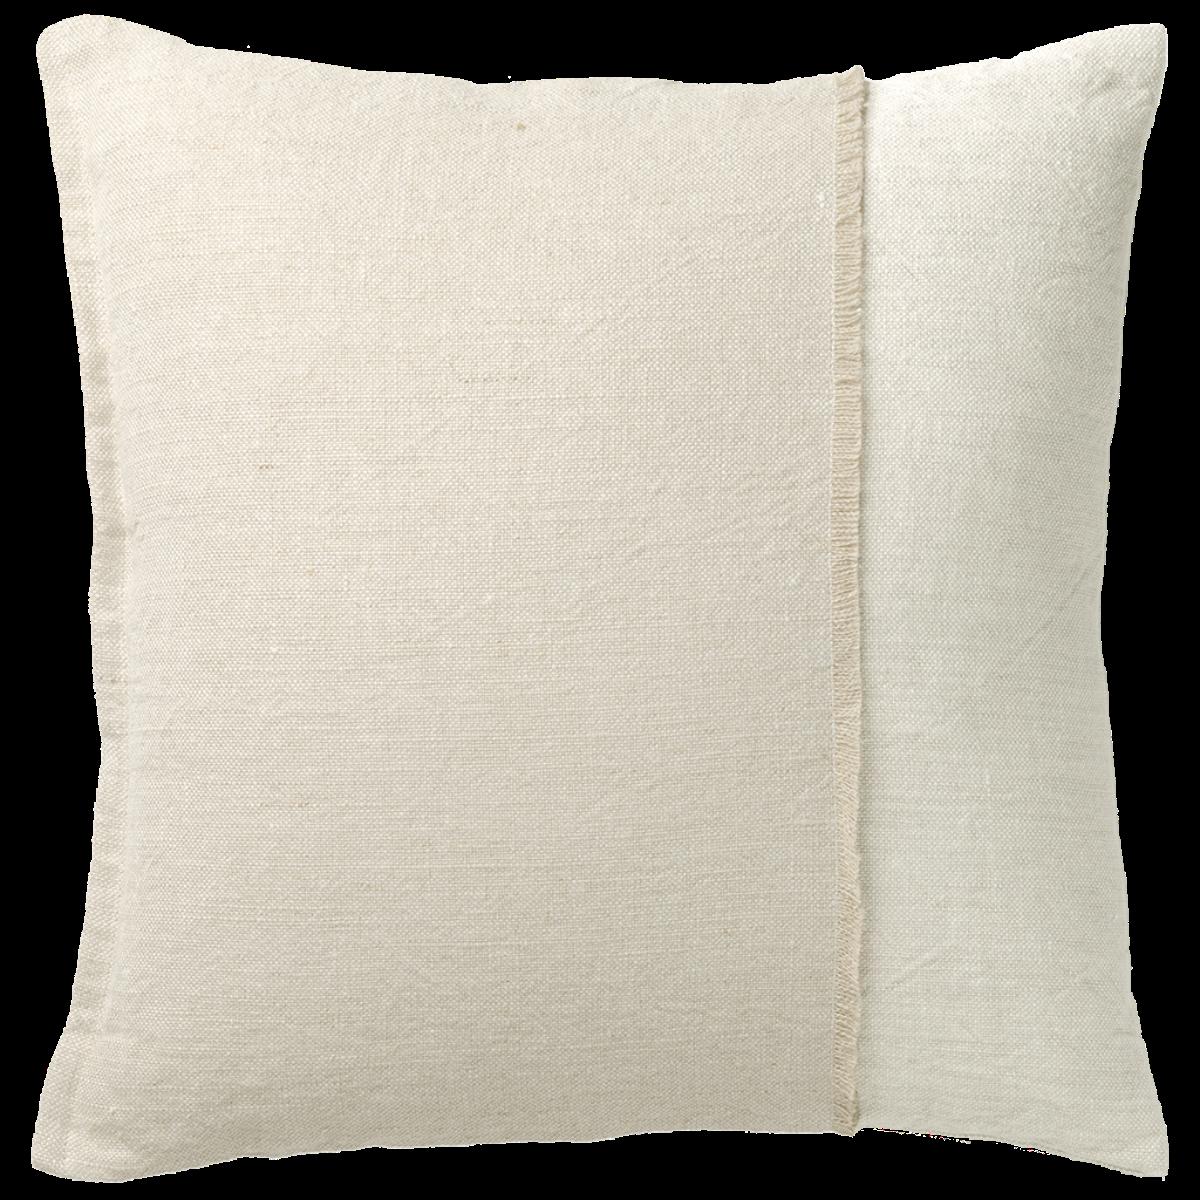 de Le Cuona | Haiku Panel Cushion With Fringe Detail Husk/Paper